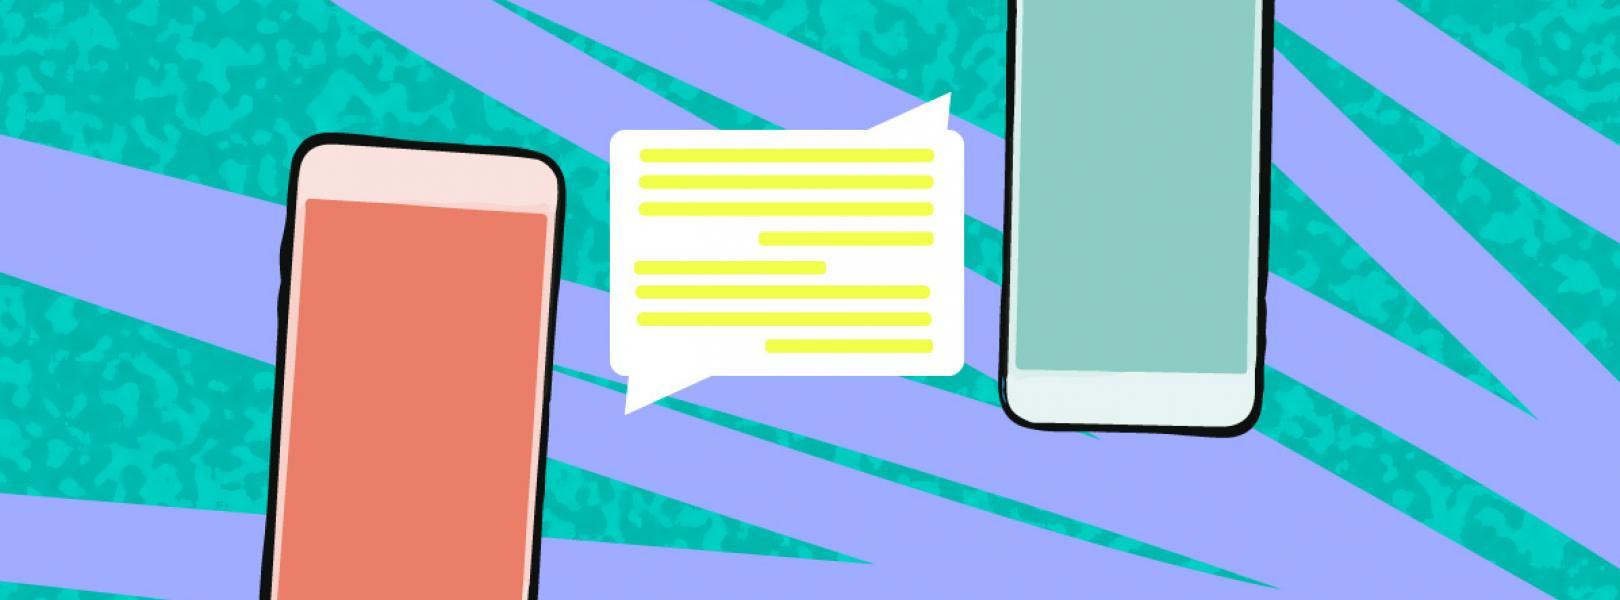 Cellular phone text messaging